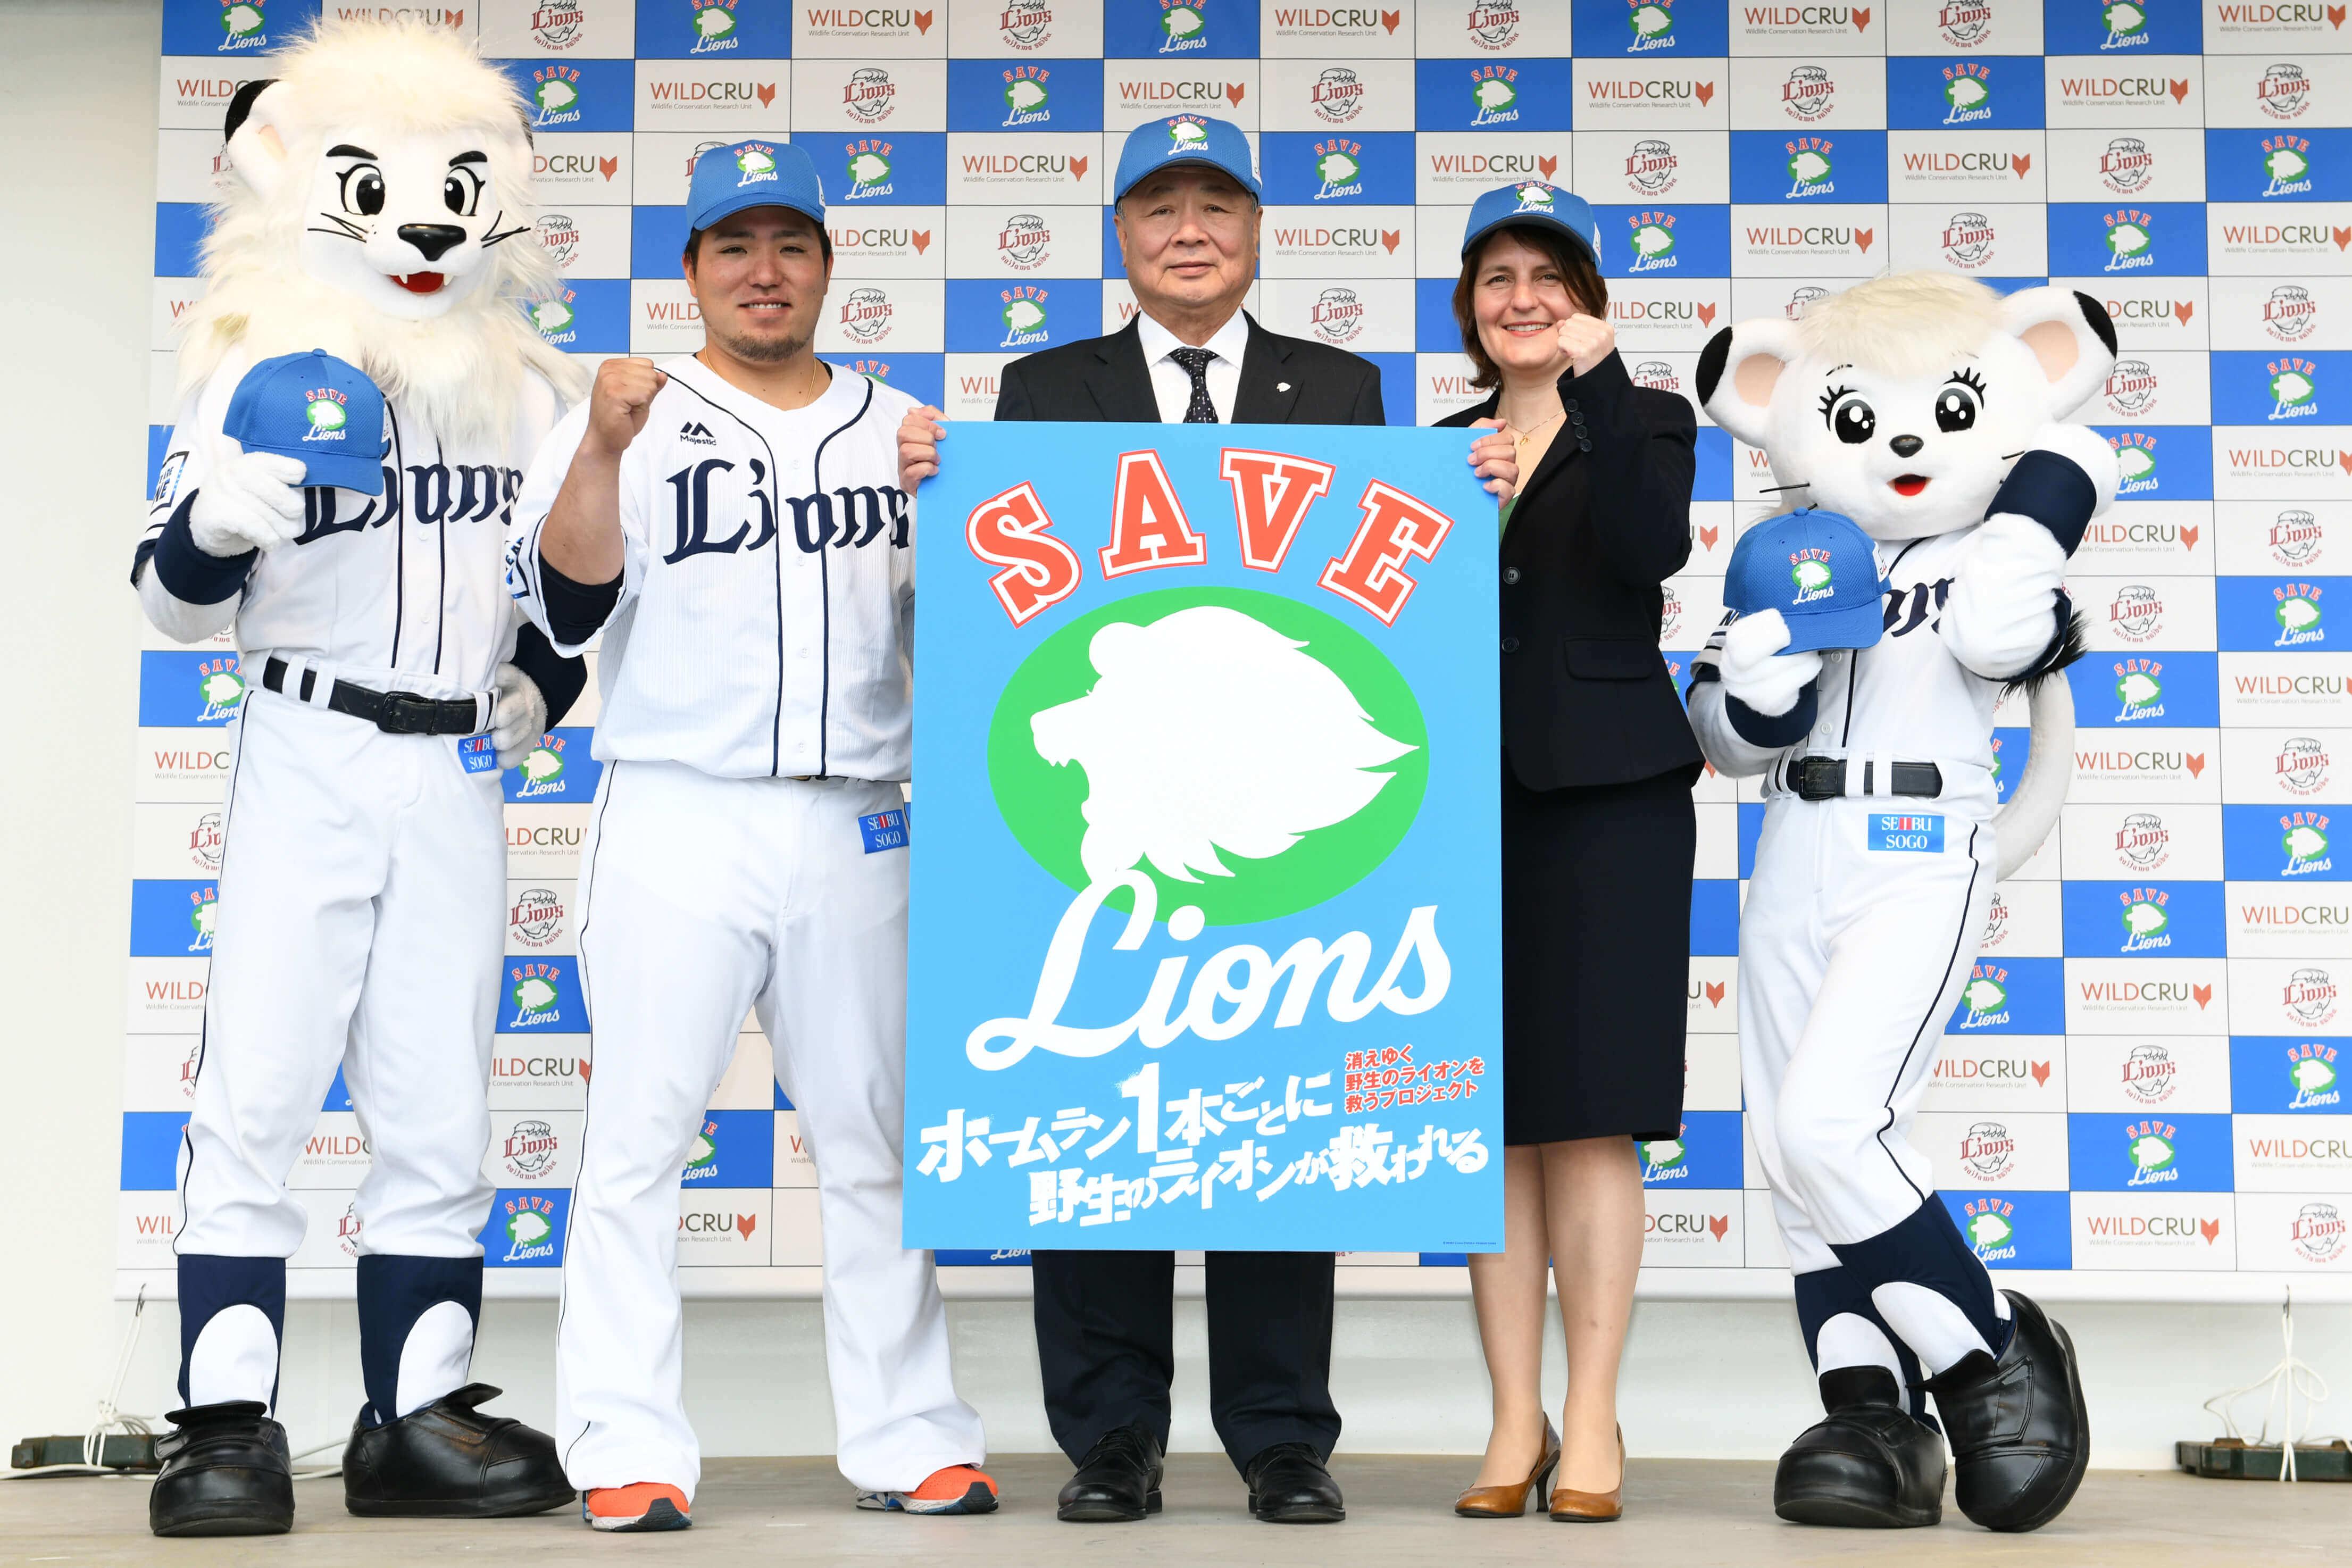 SAVE LIONS 株式会社西武ライオンズ